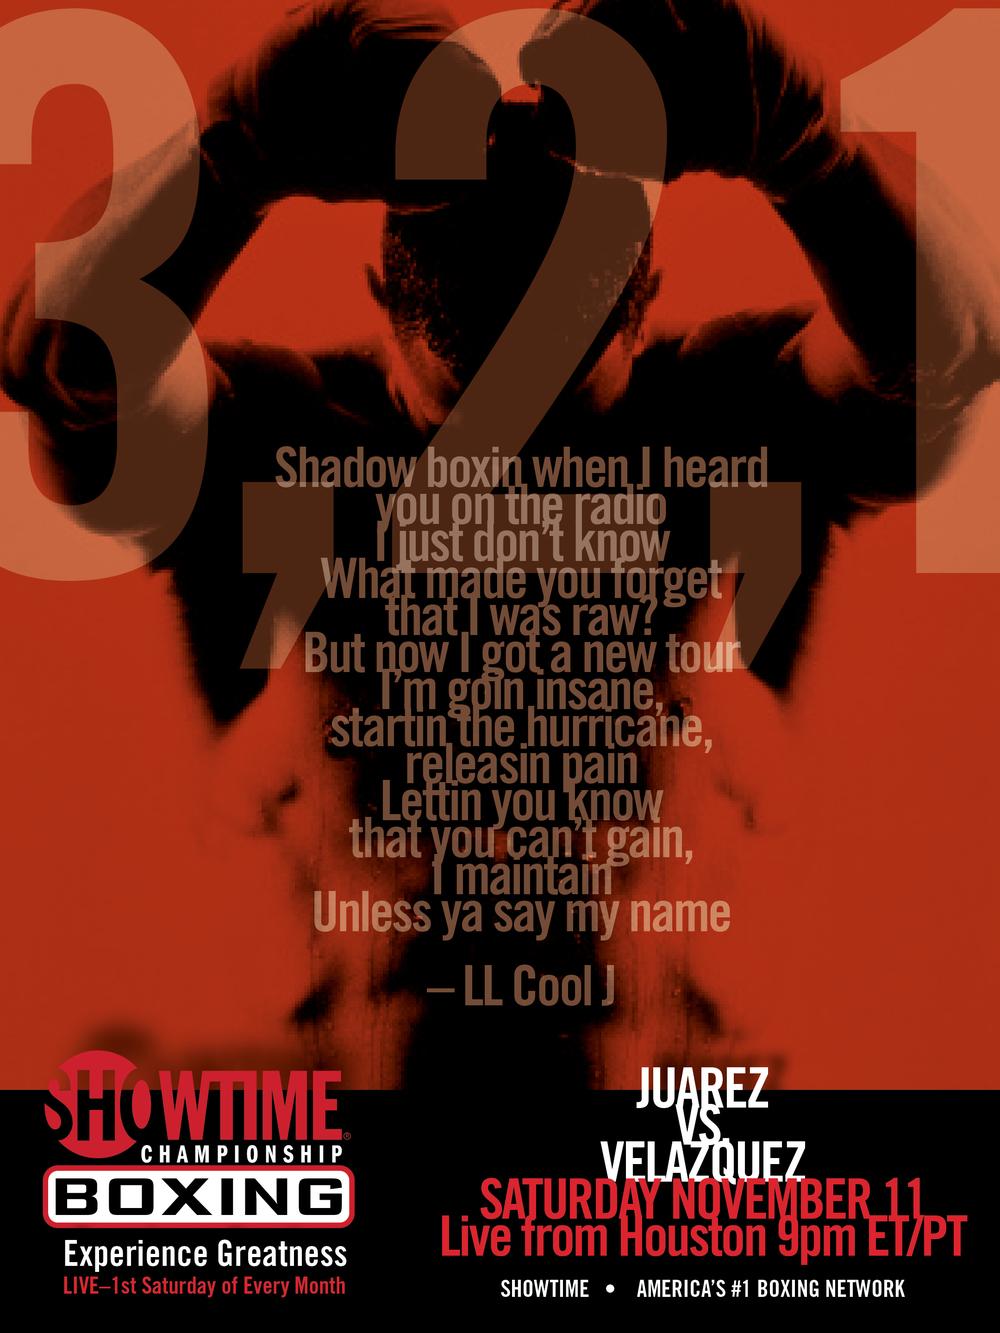 ShowtimeBoxing11.07.jpg